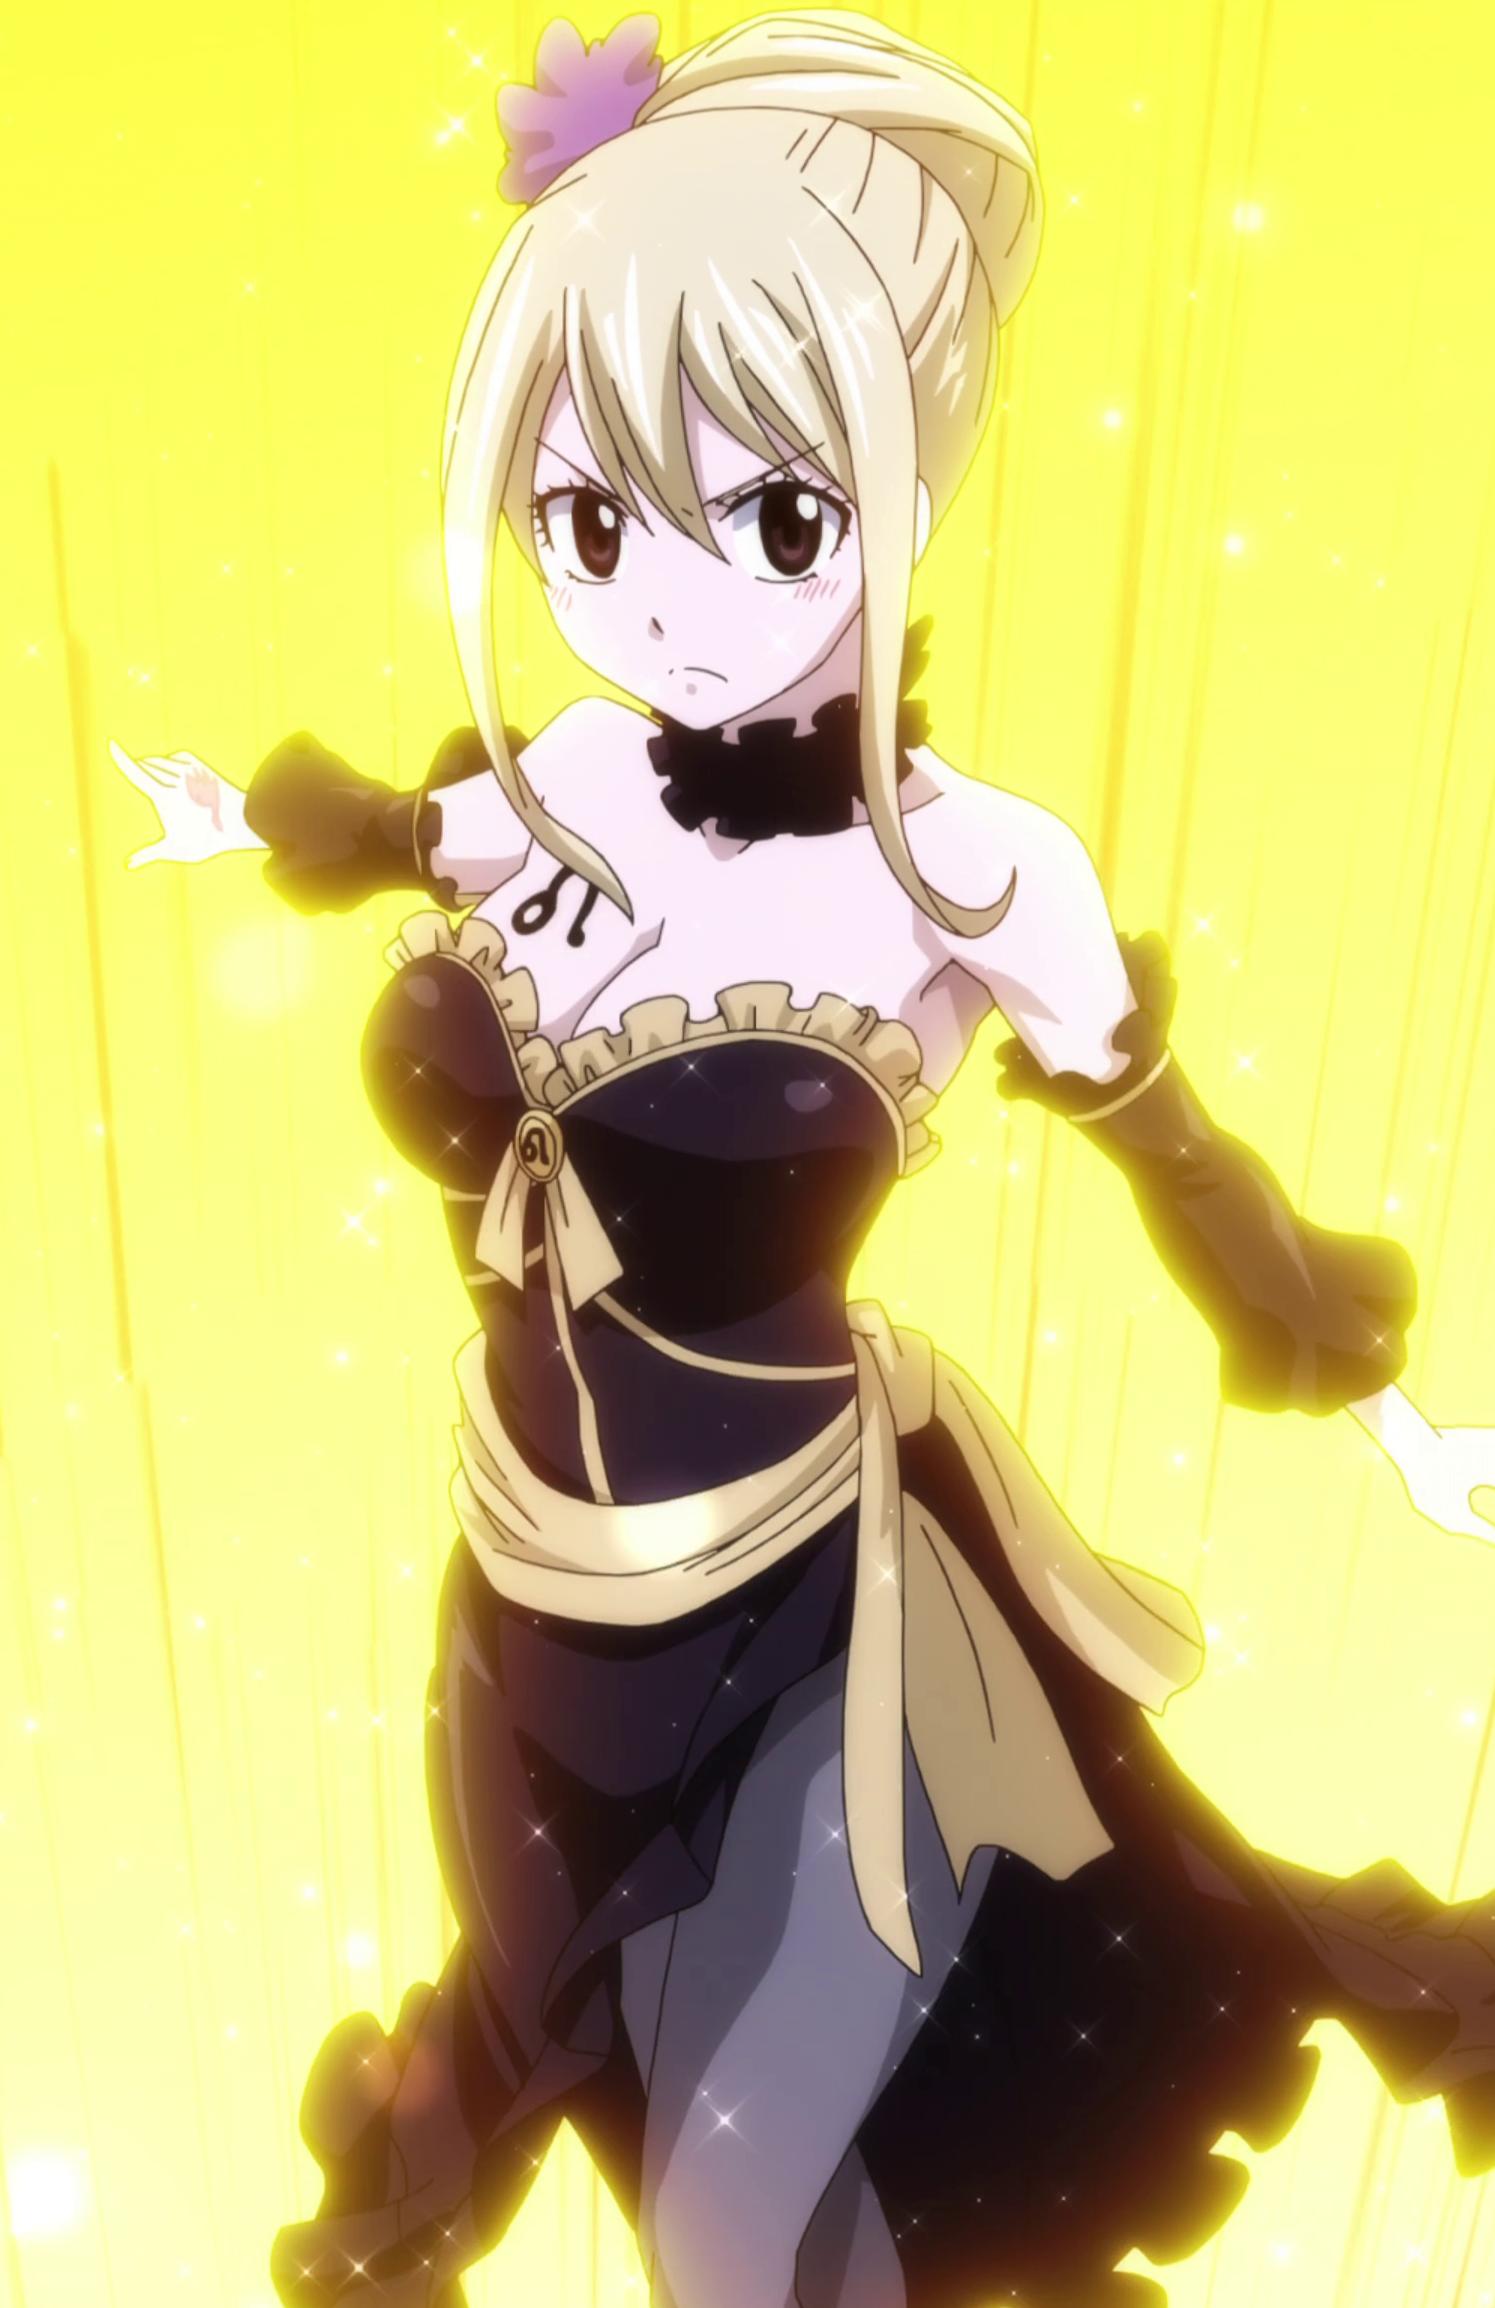 Star Dress Fairy Tail Anime Lucy Fairy Tail Anime Fairy Tail Girls